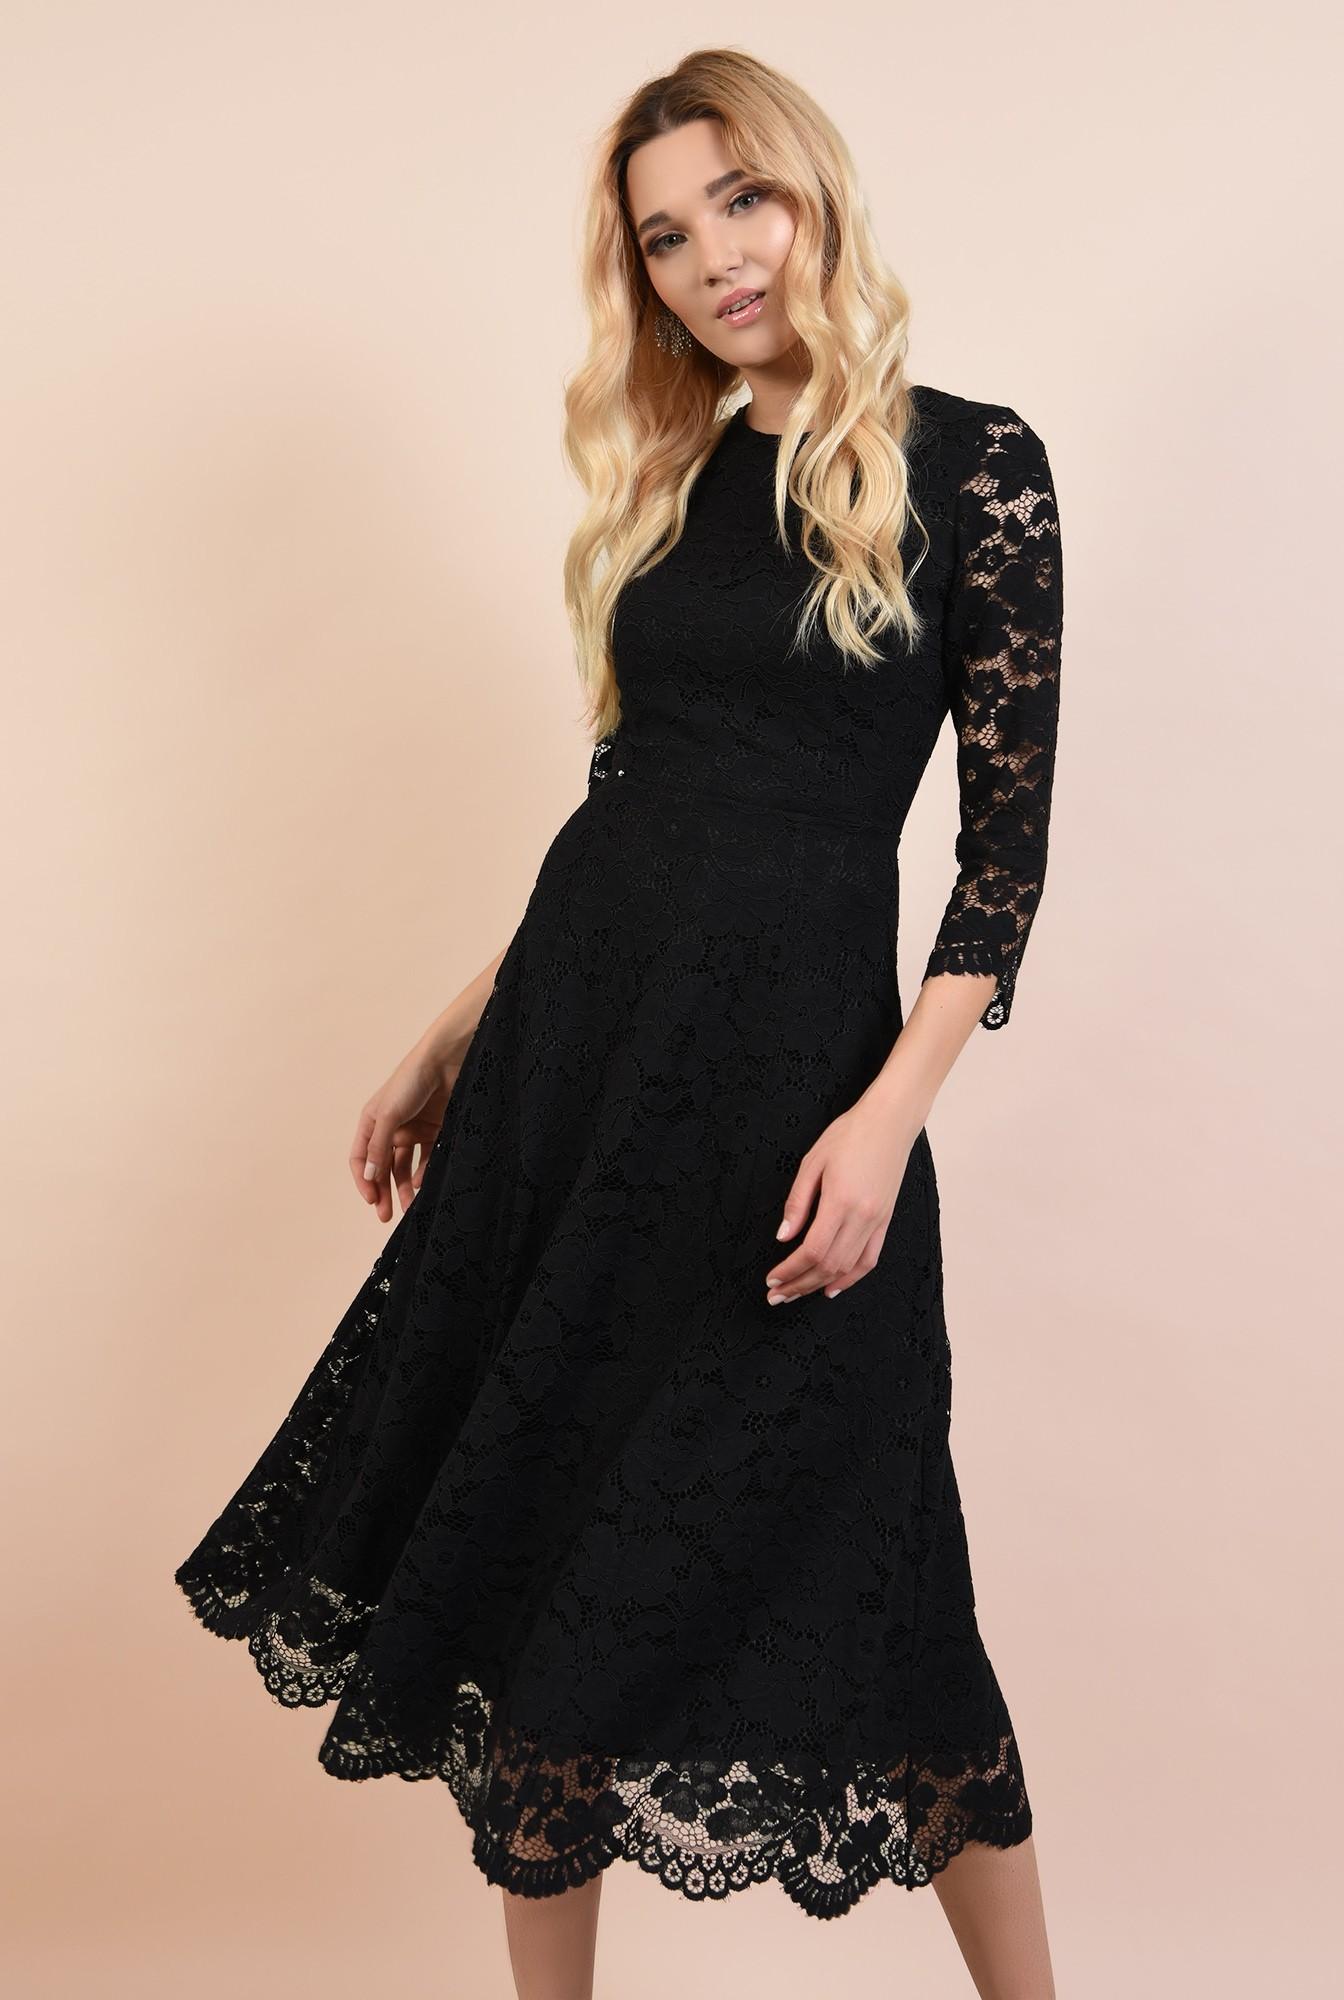 2 - rochie neagra, de seara, midi, evazata, spate decoltat